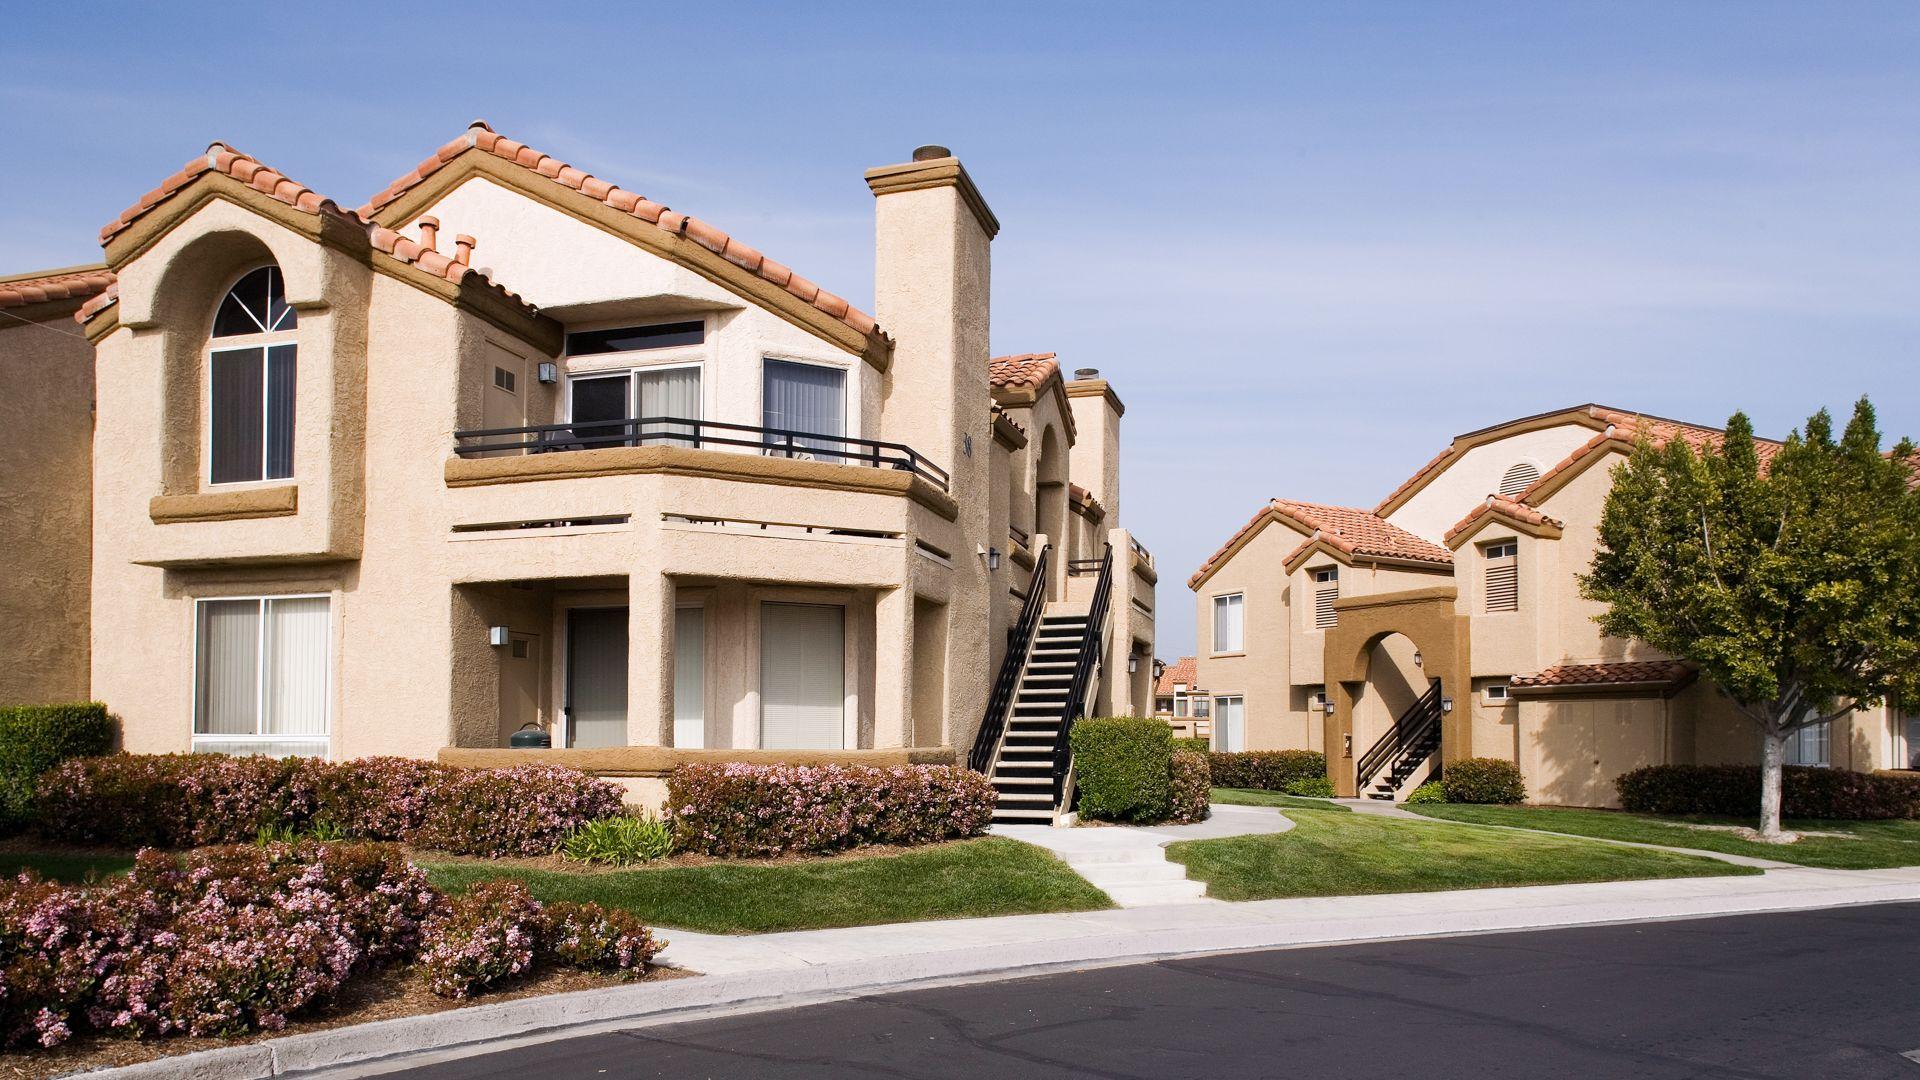 Apartments vista del lago apartments - mission viejo - 21622 marguerite